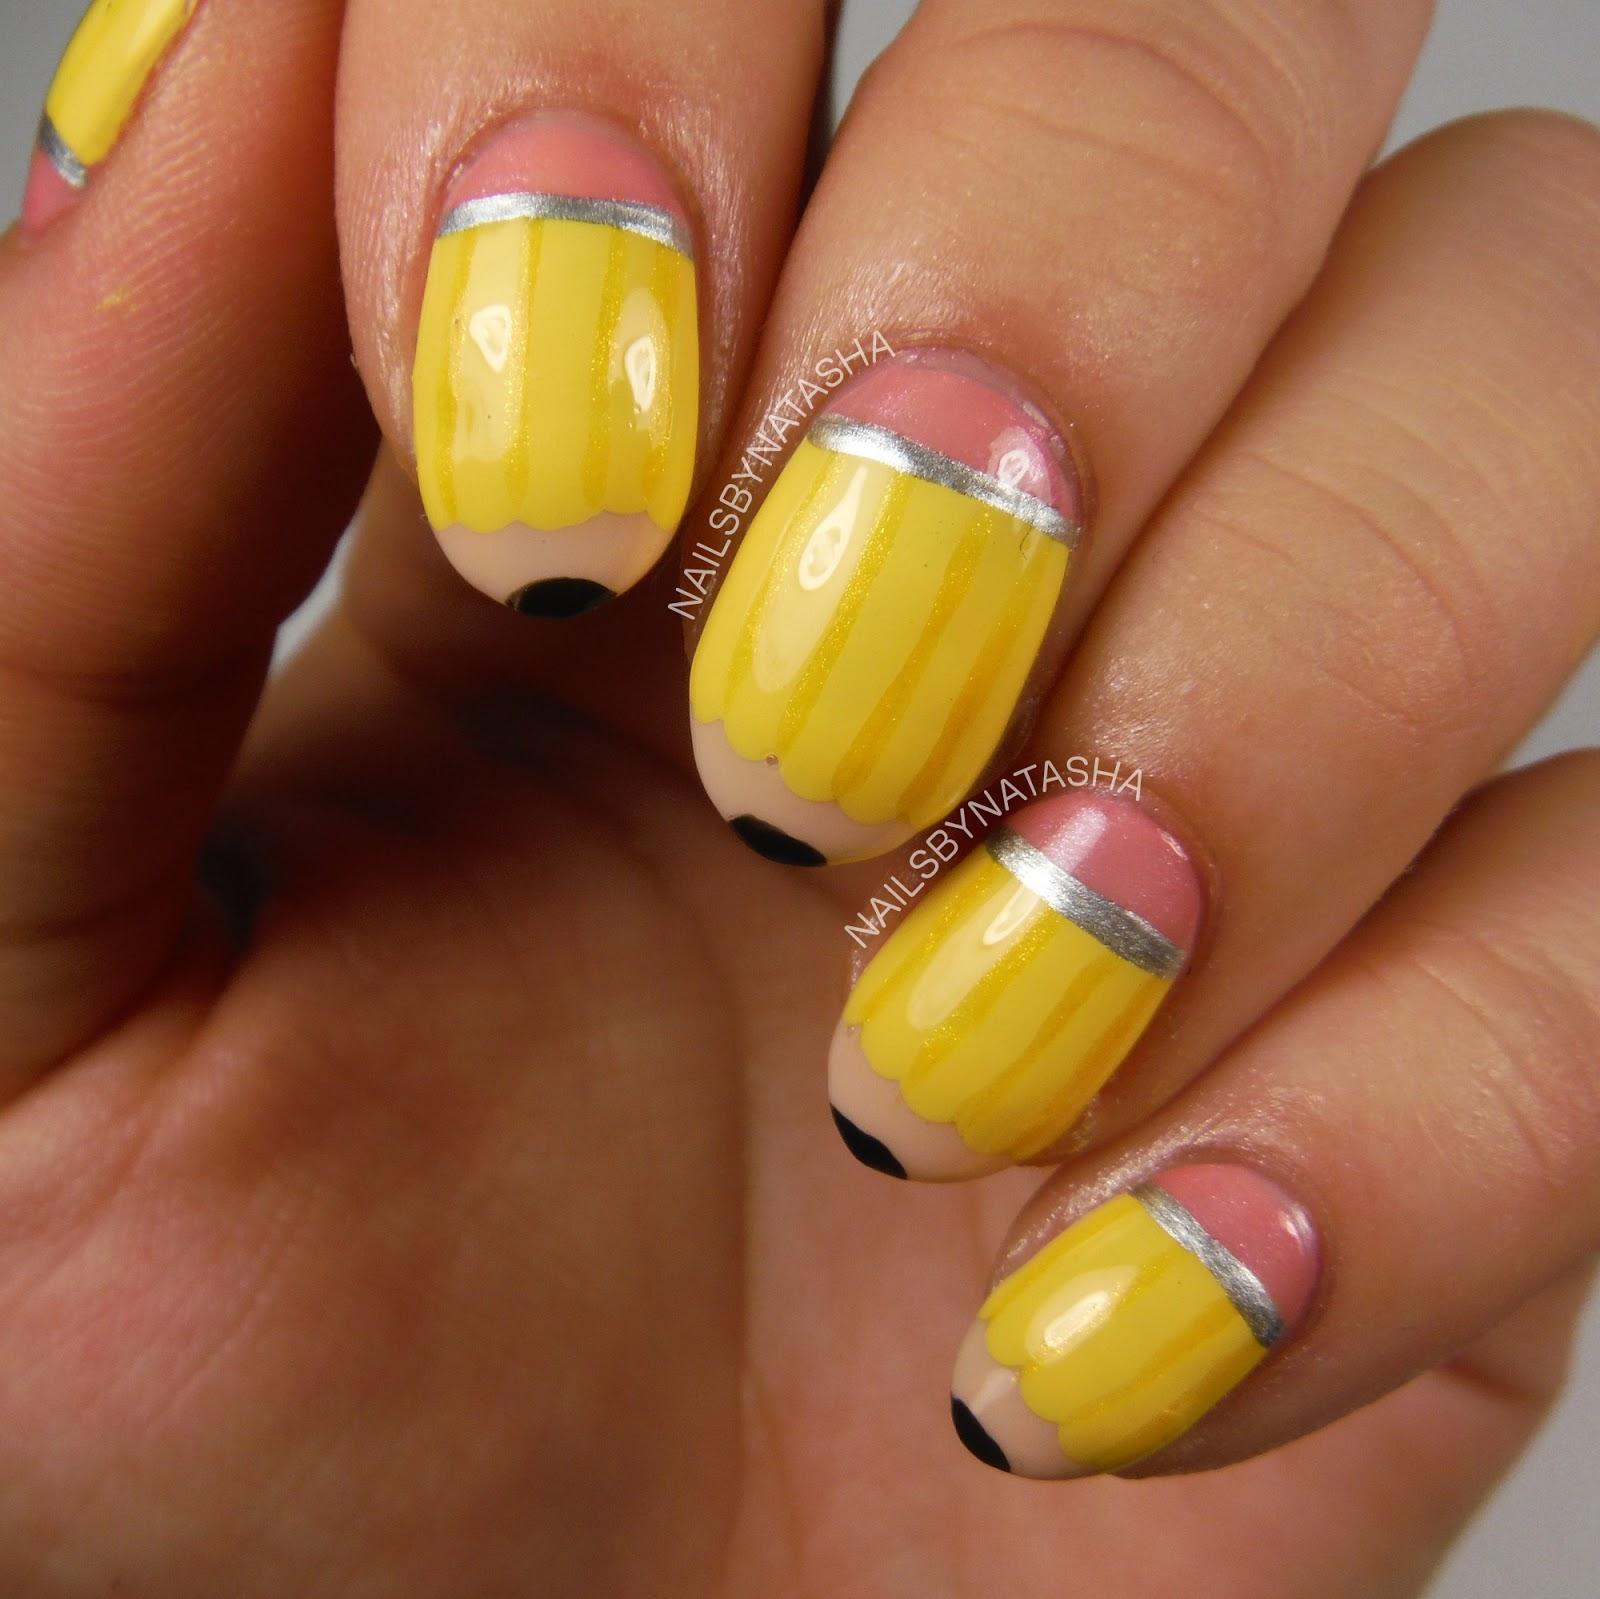 Nails By Natasha: Nail Art August Day 11: School